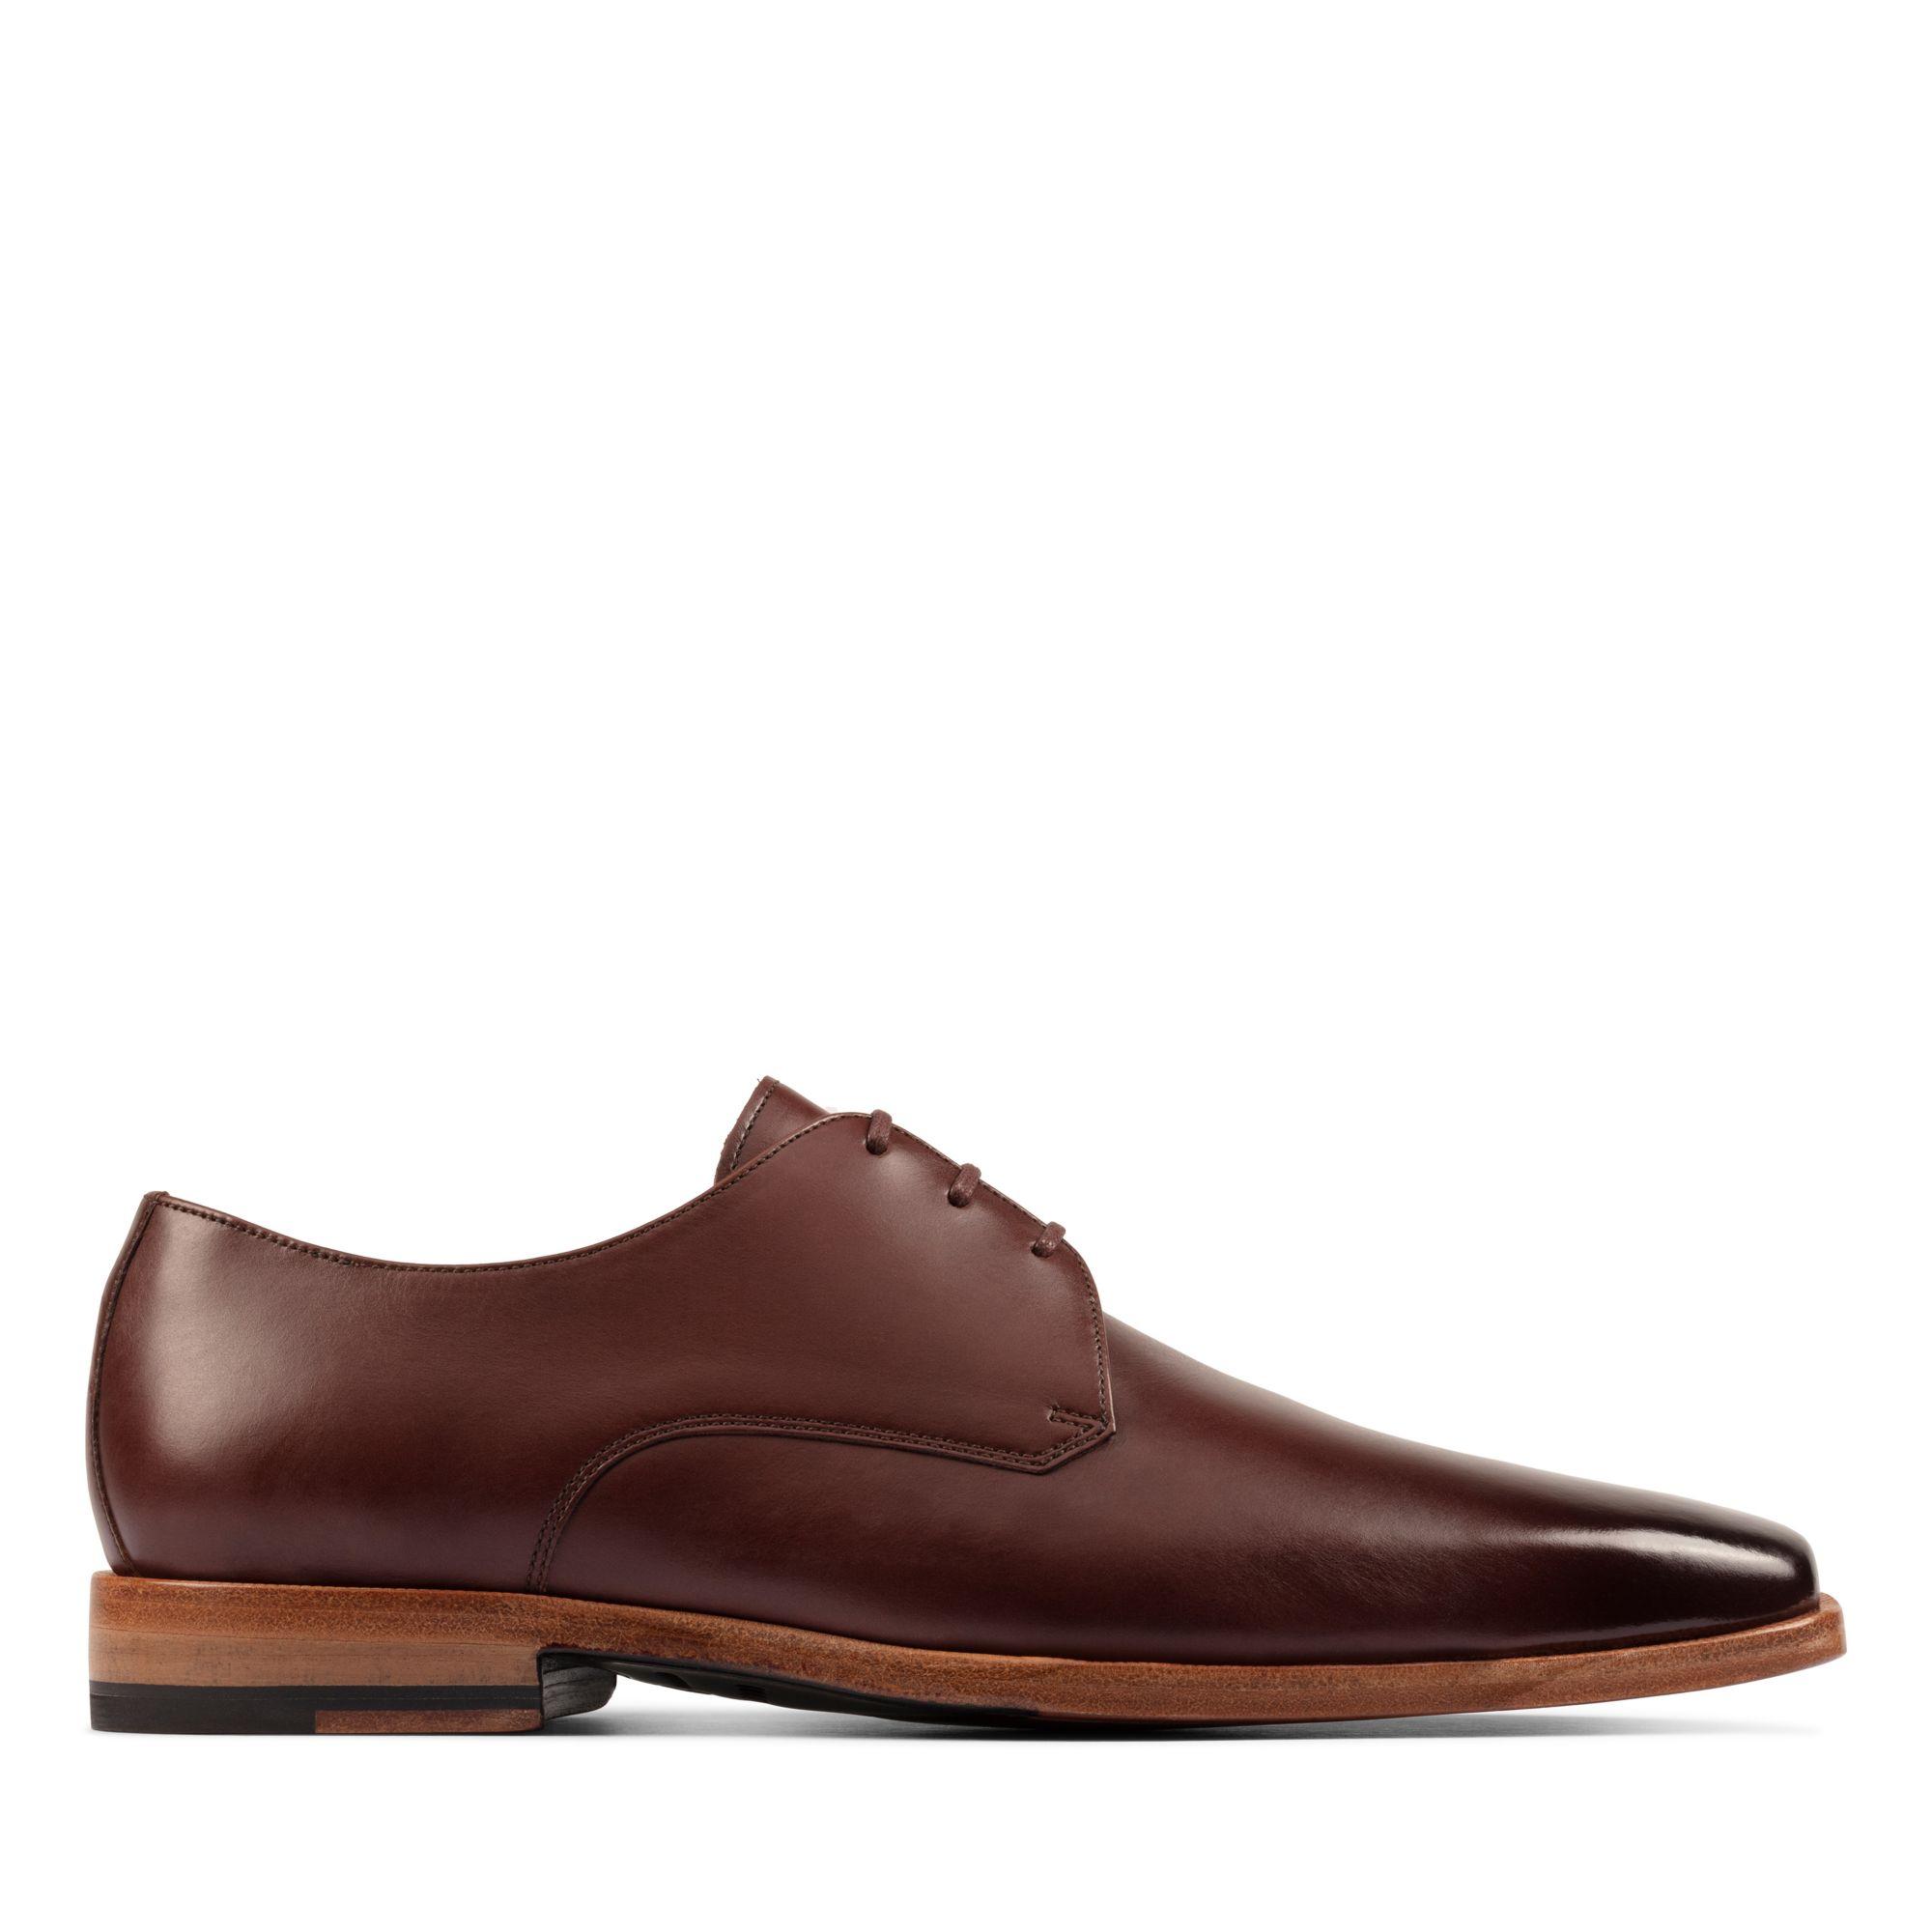 Clarks Citi Man Walk – Leather